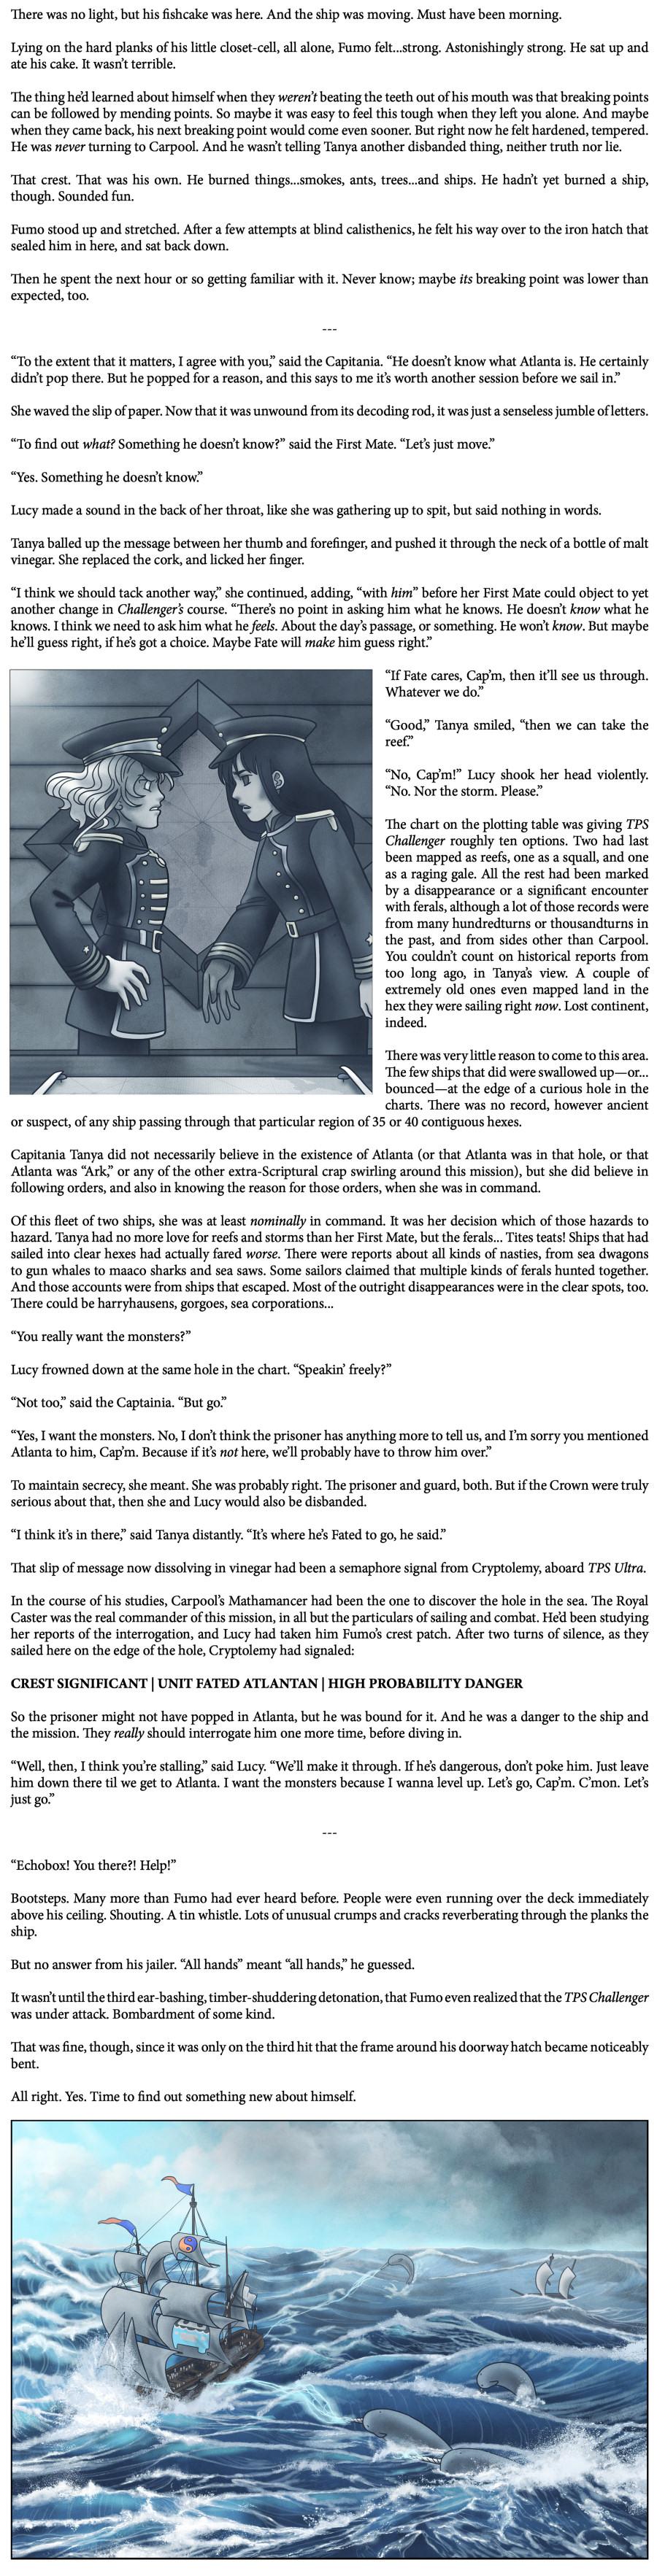 Comic - Book 5 - Page 9